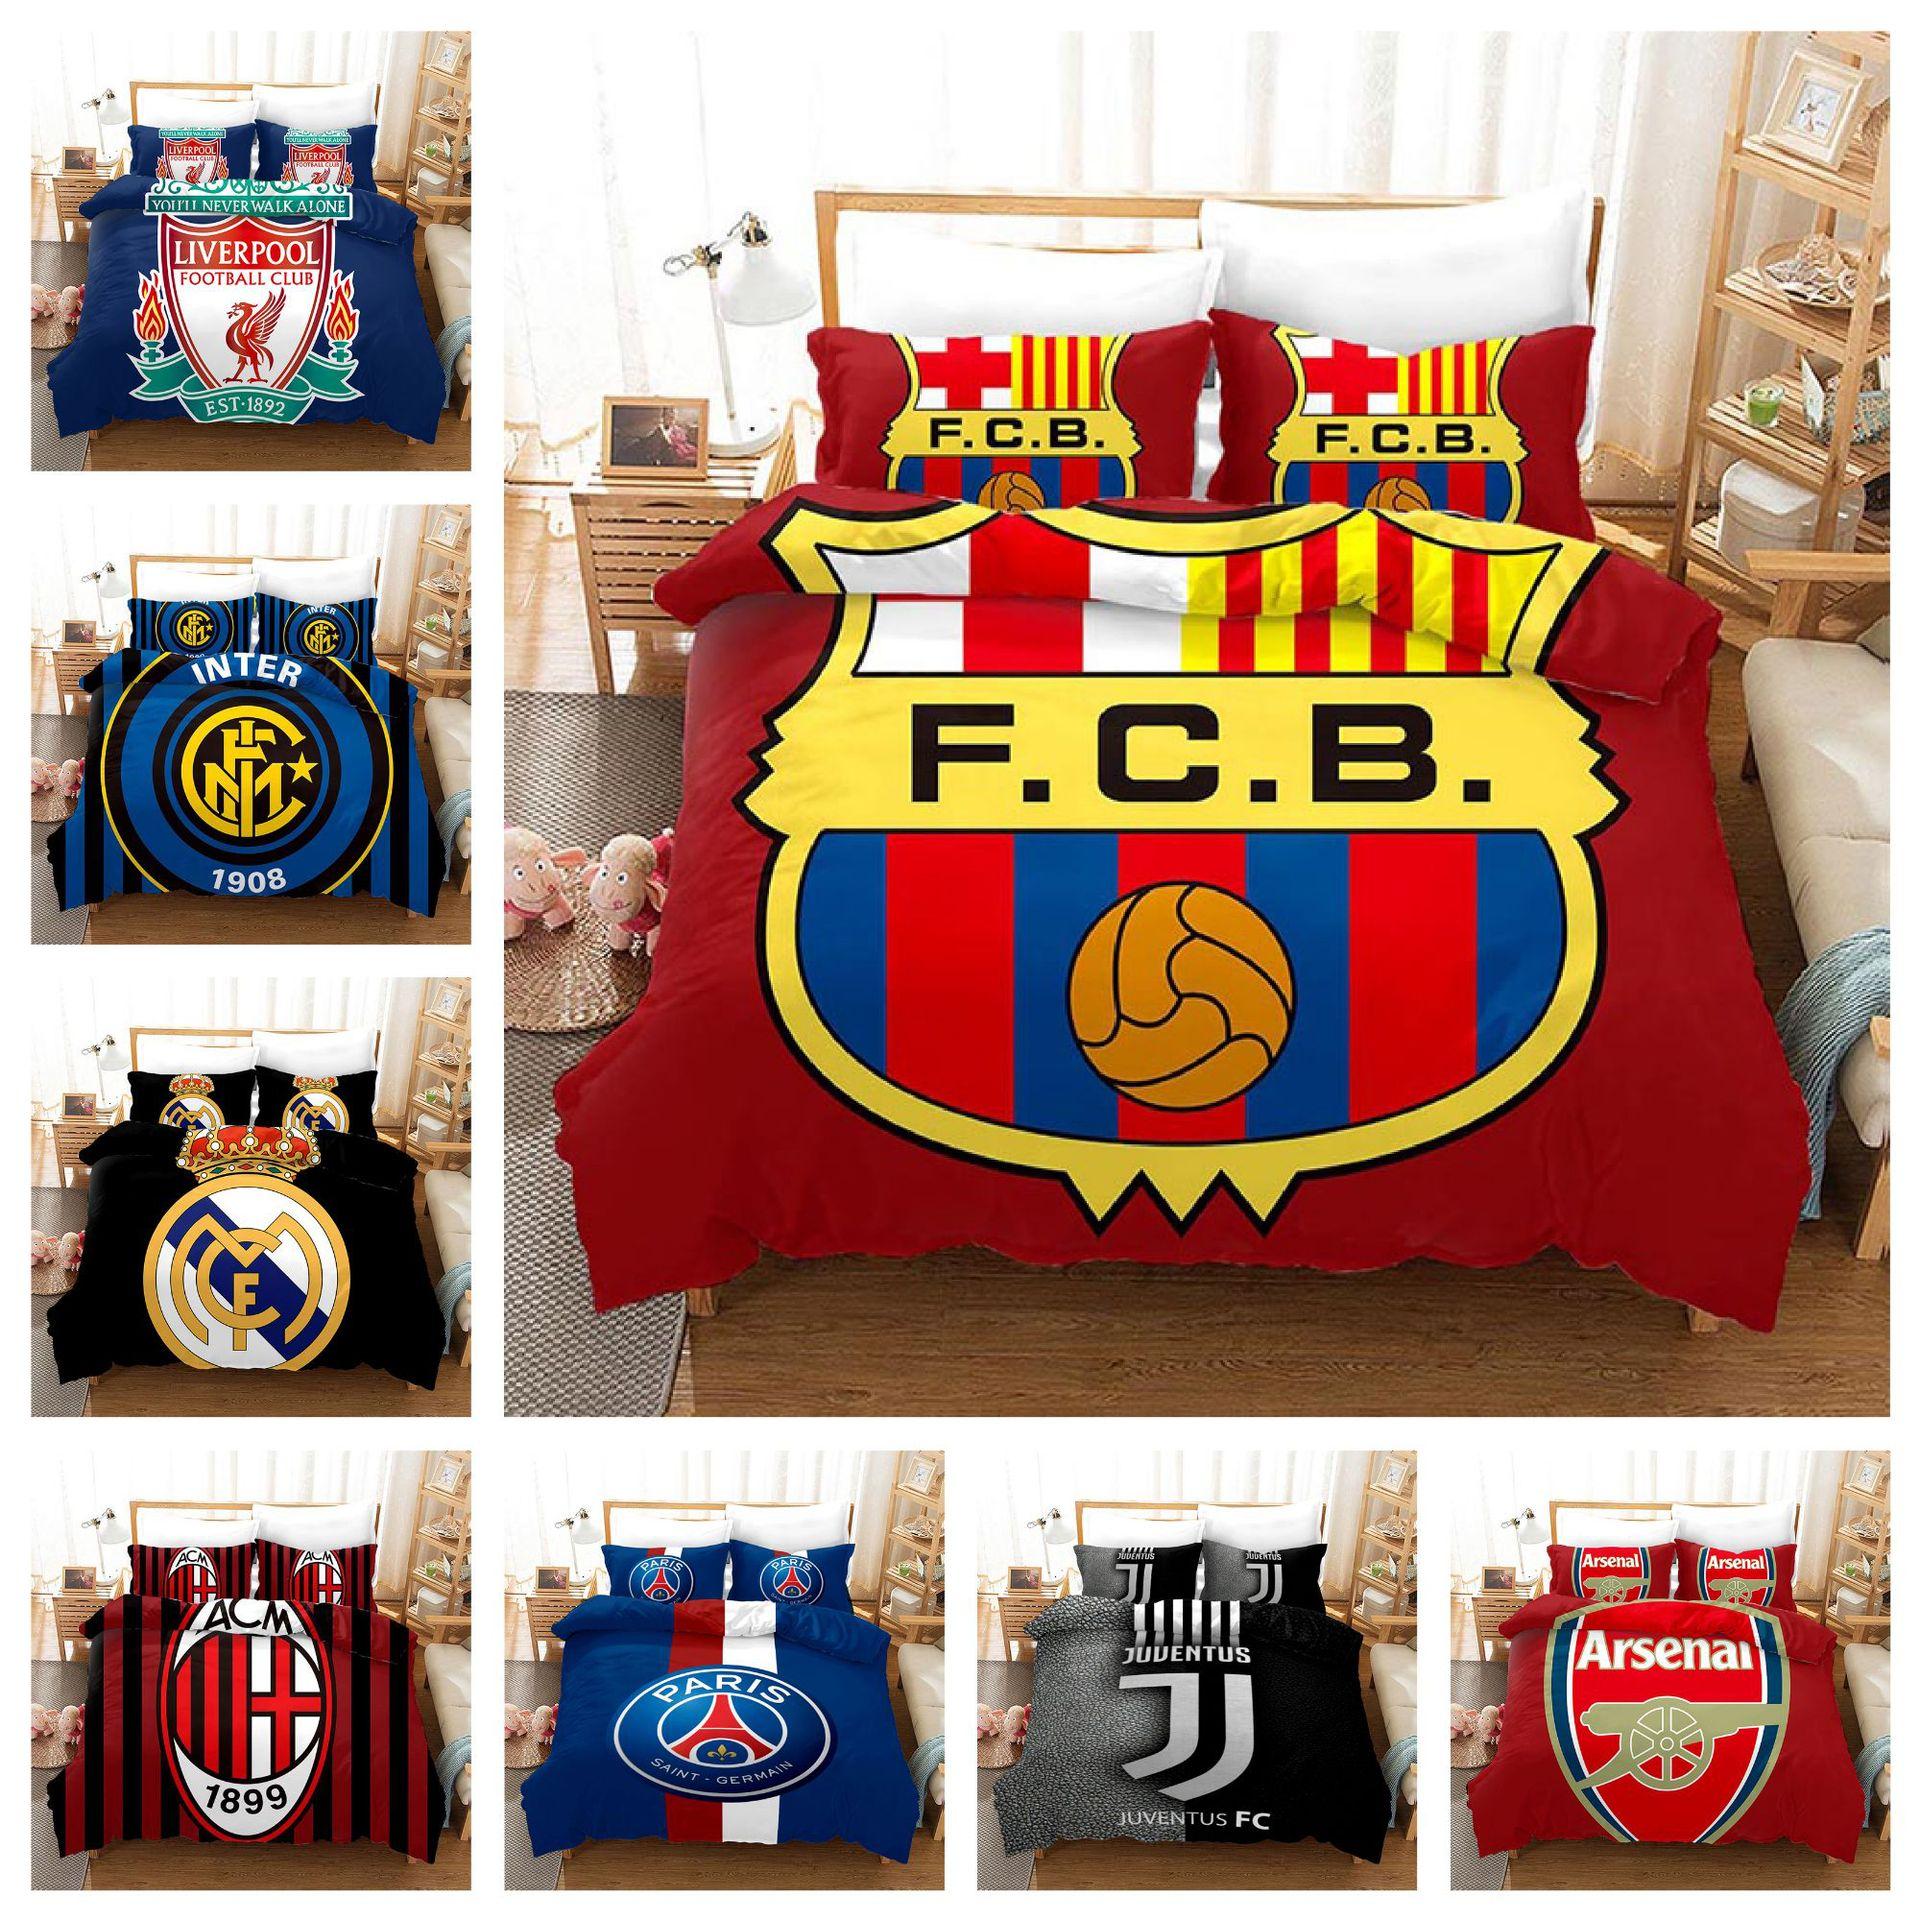 Home Textile Football Club 3D Bedding Set Quilt Duvet Cover Pillowcases Bed Linens Set Twin Full Queen King Single Double 2-3PCS